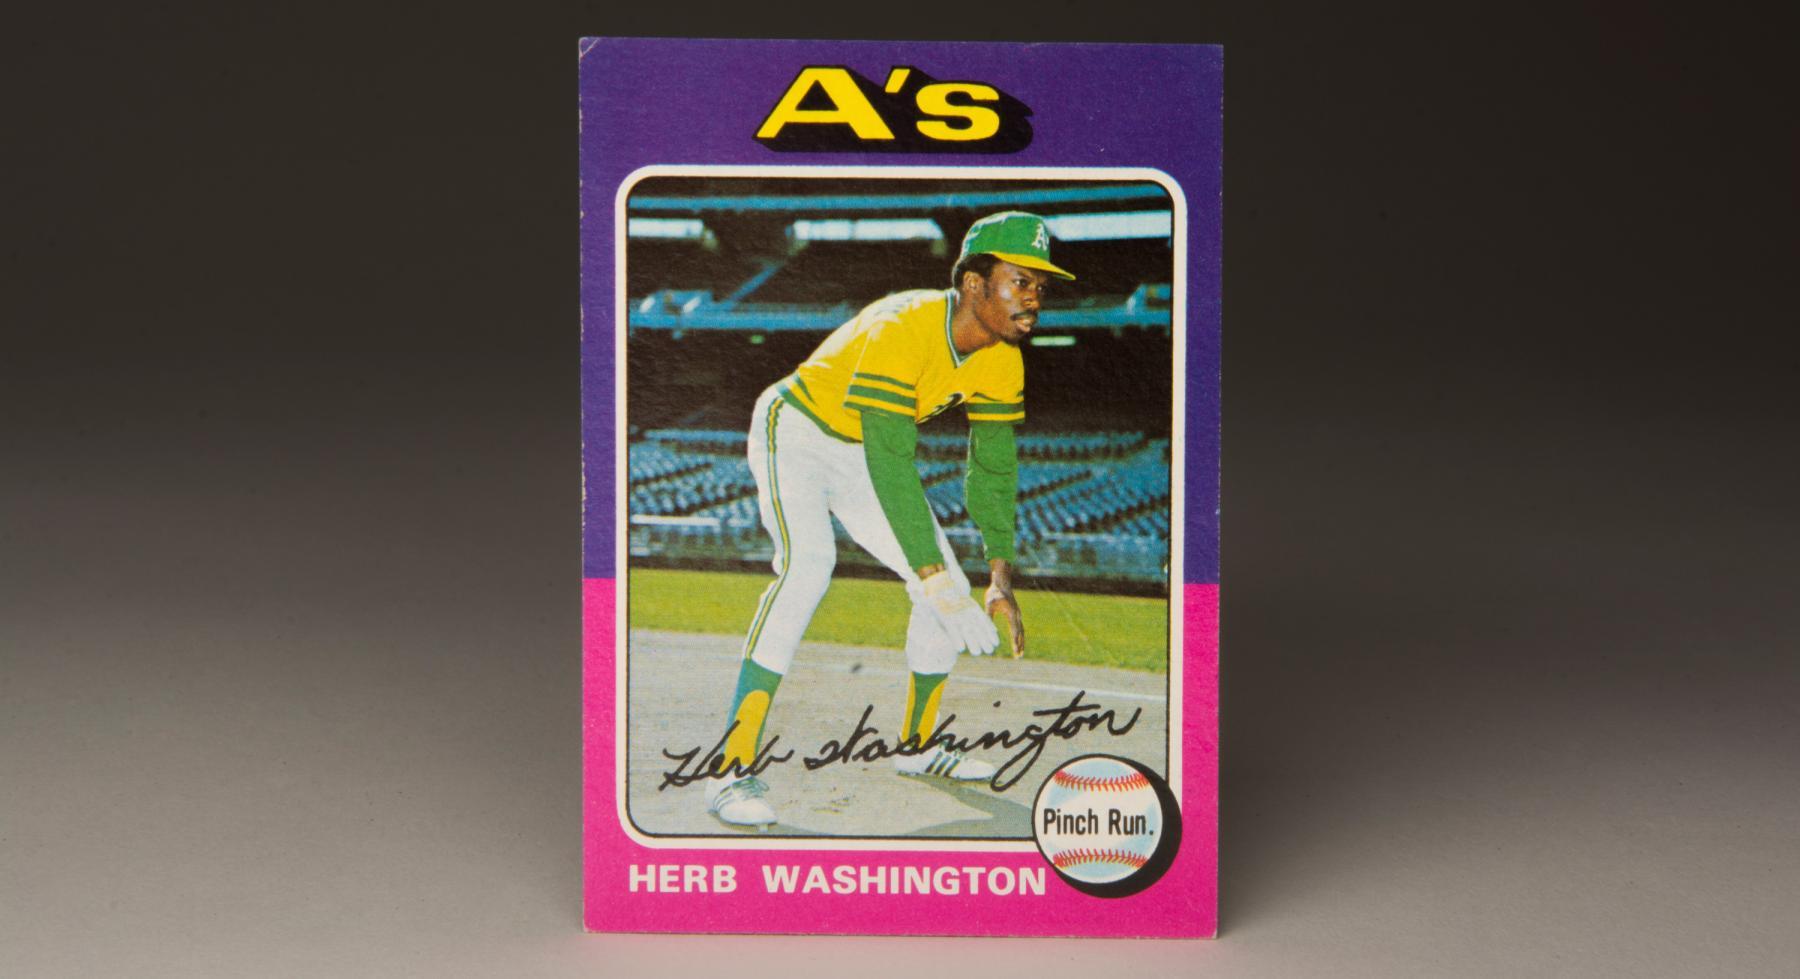 1975 Herb Washington Topps card. (Milo Stewart, Jr. / National Baseball Hall of Fame)